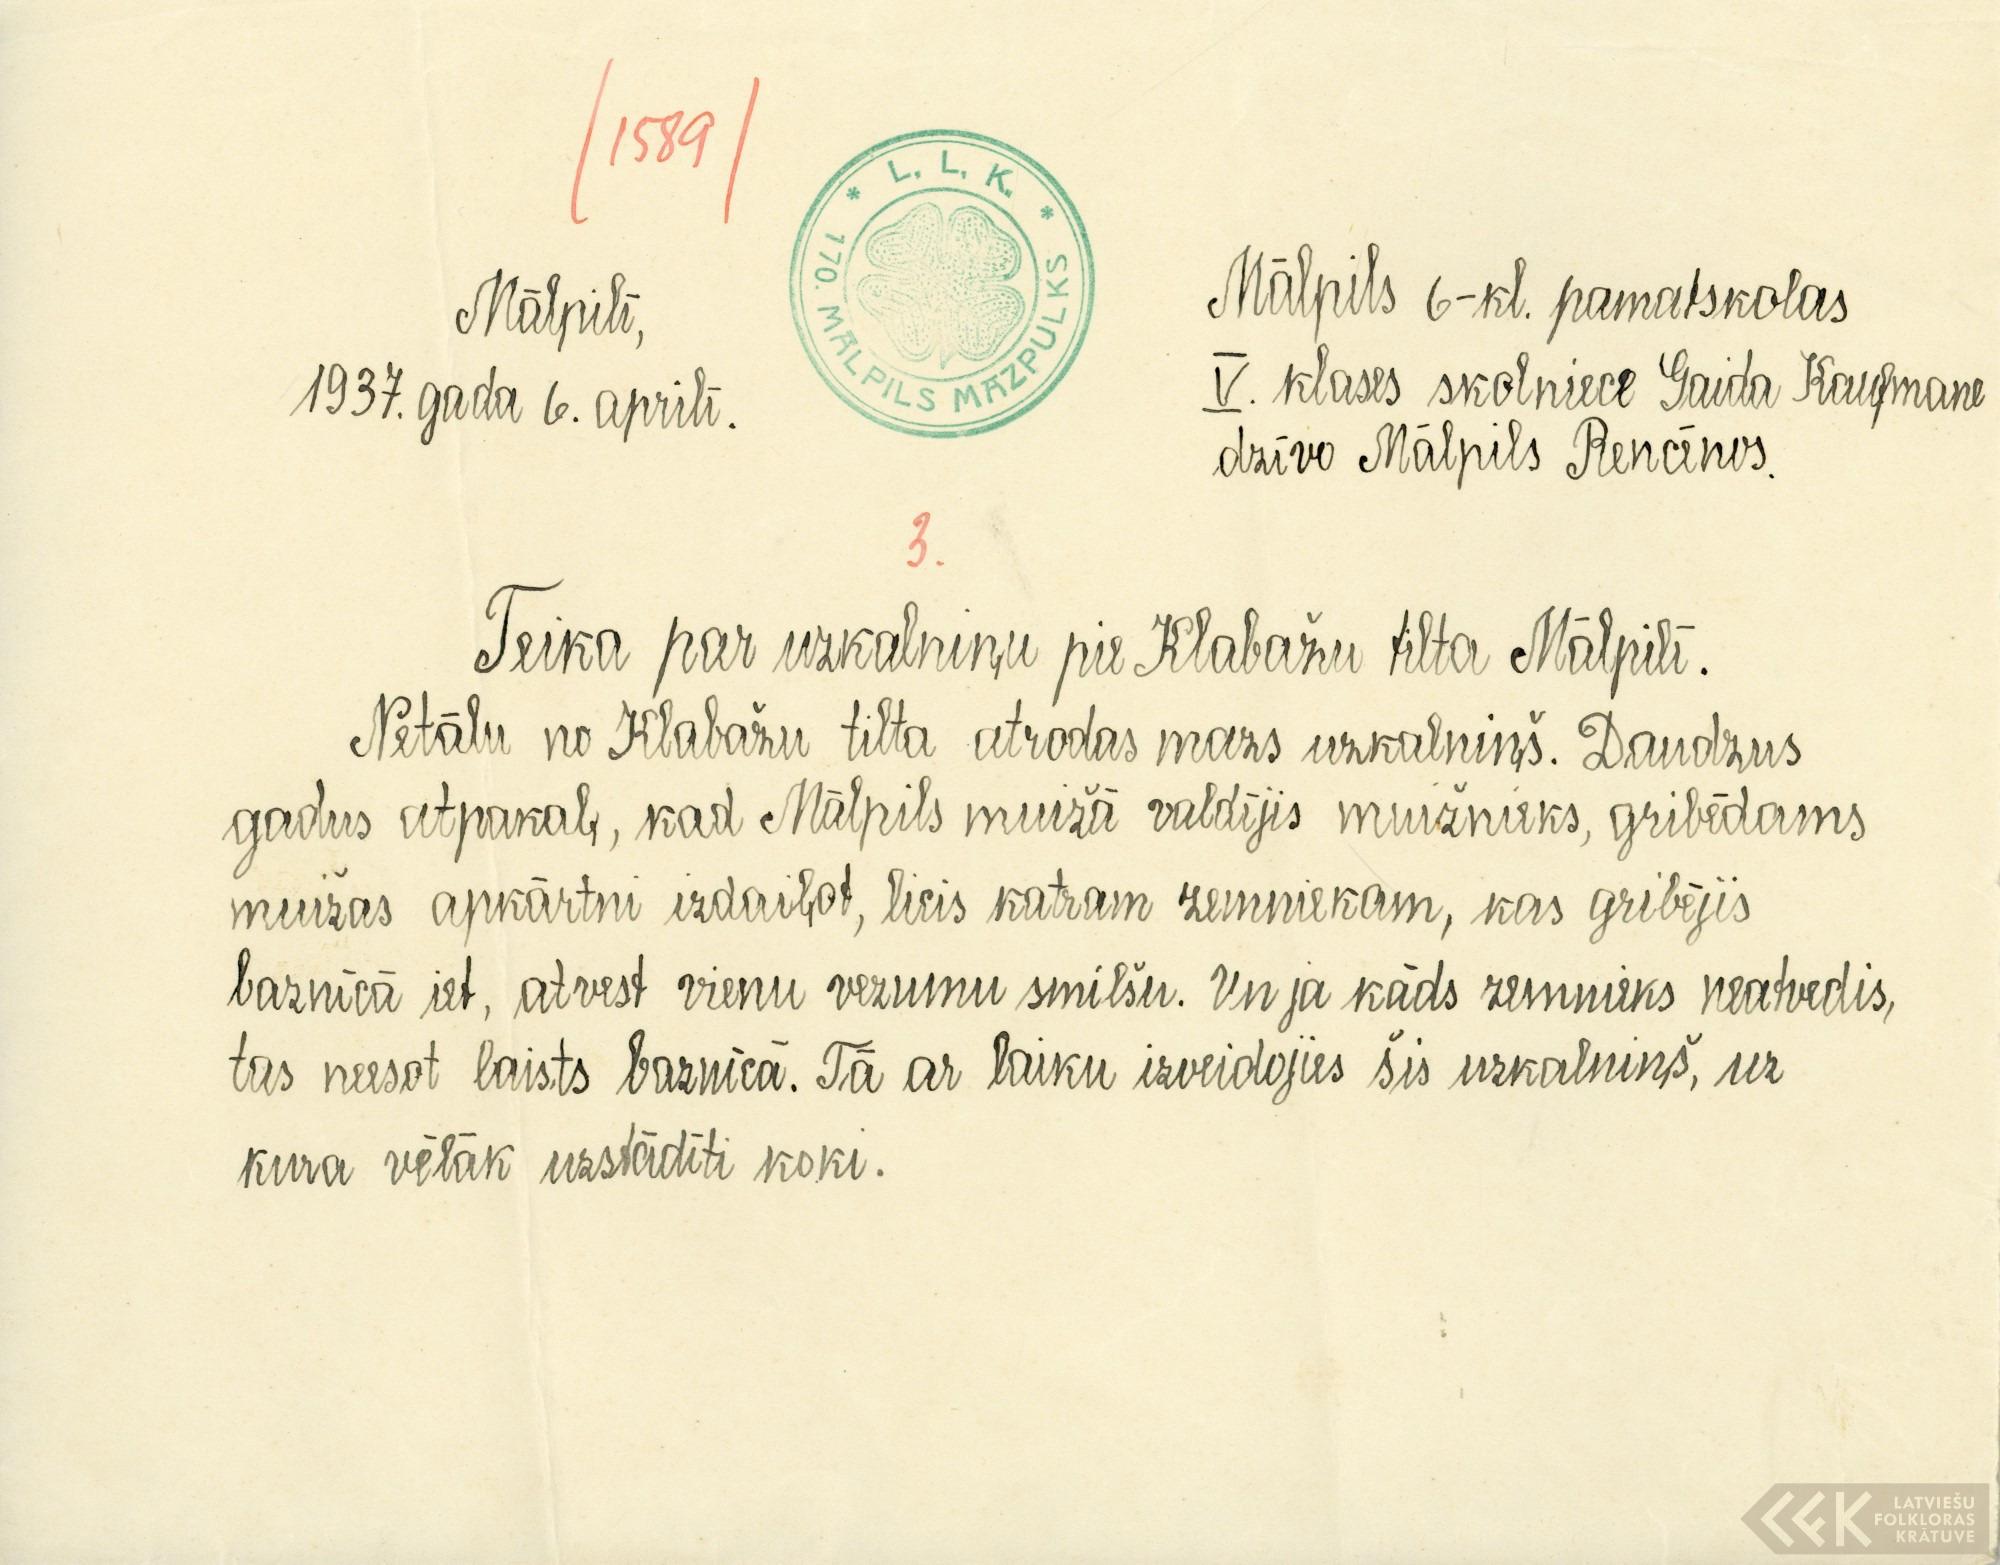 1589-Malpils-mazpulks-01-0005